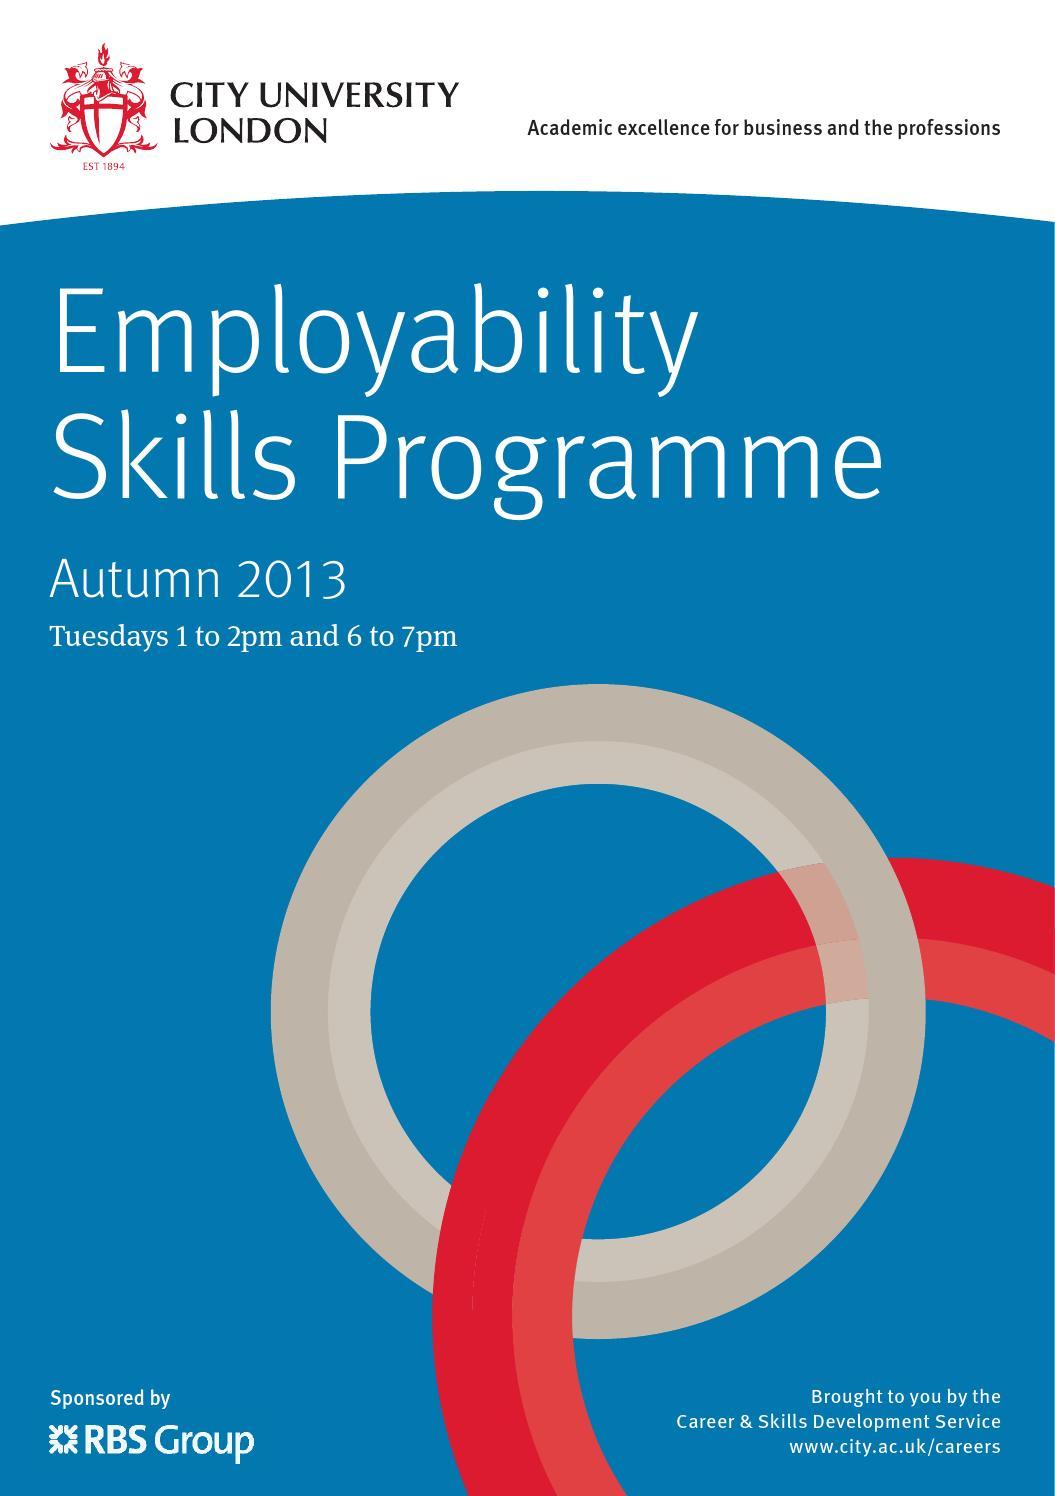 2013 employability skills programme by city university of london 2013 employability skills programme by city university of london issuu falaconquin